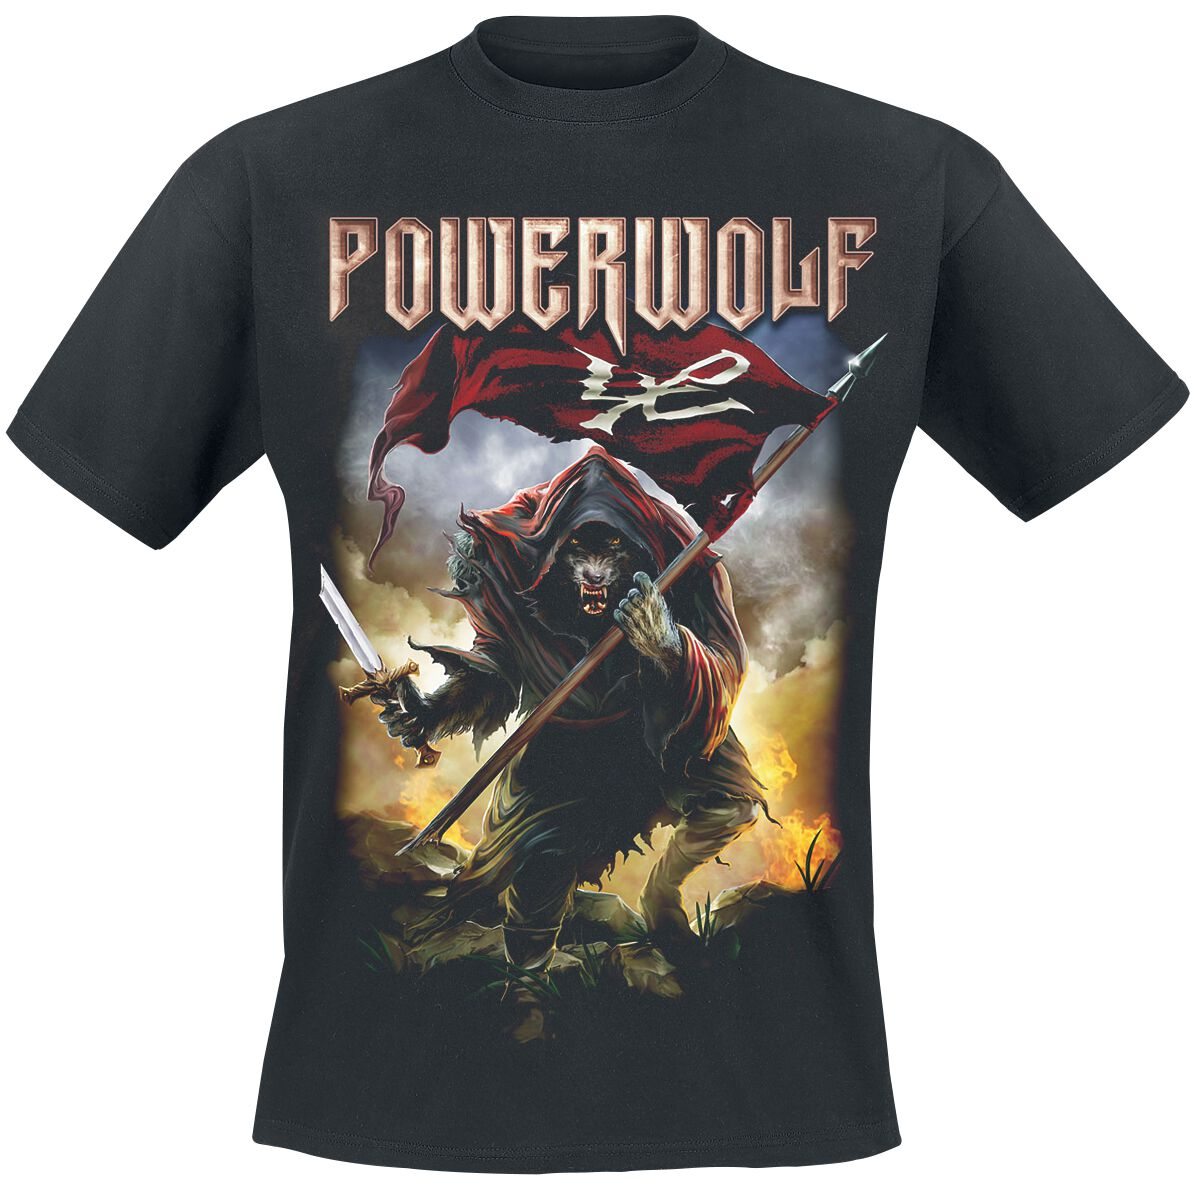 Image of   Powerwolf Wolf Warrior T-Shirt sort